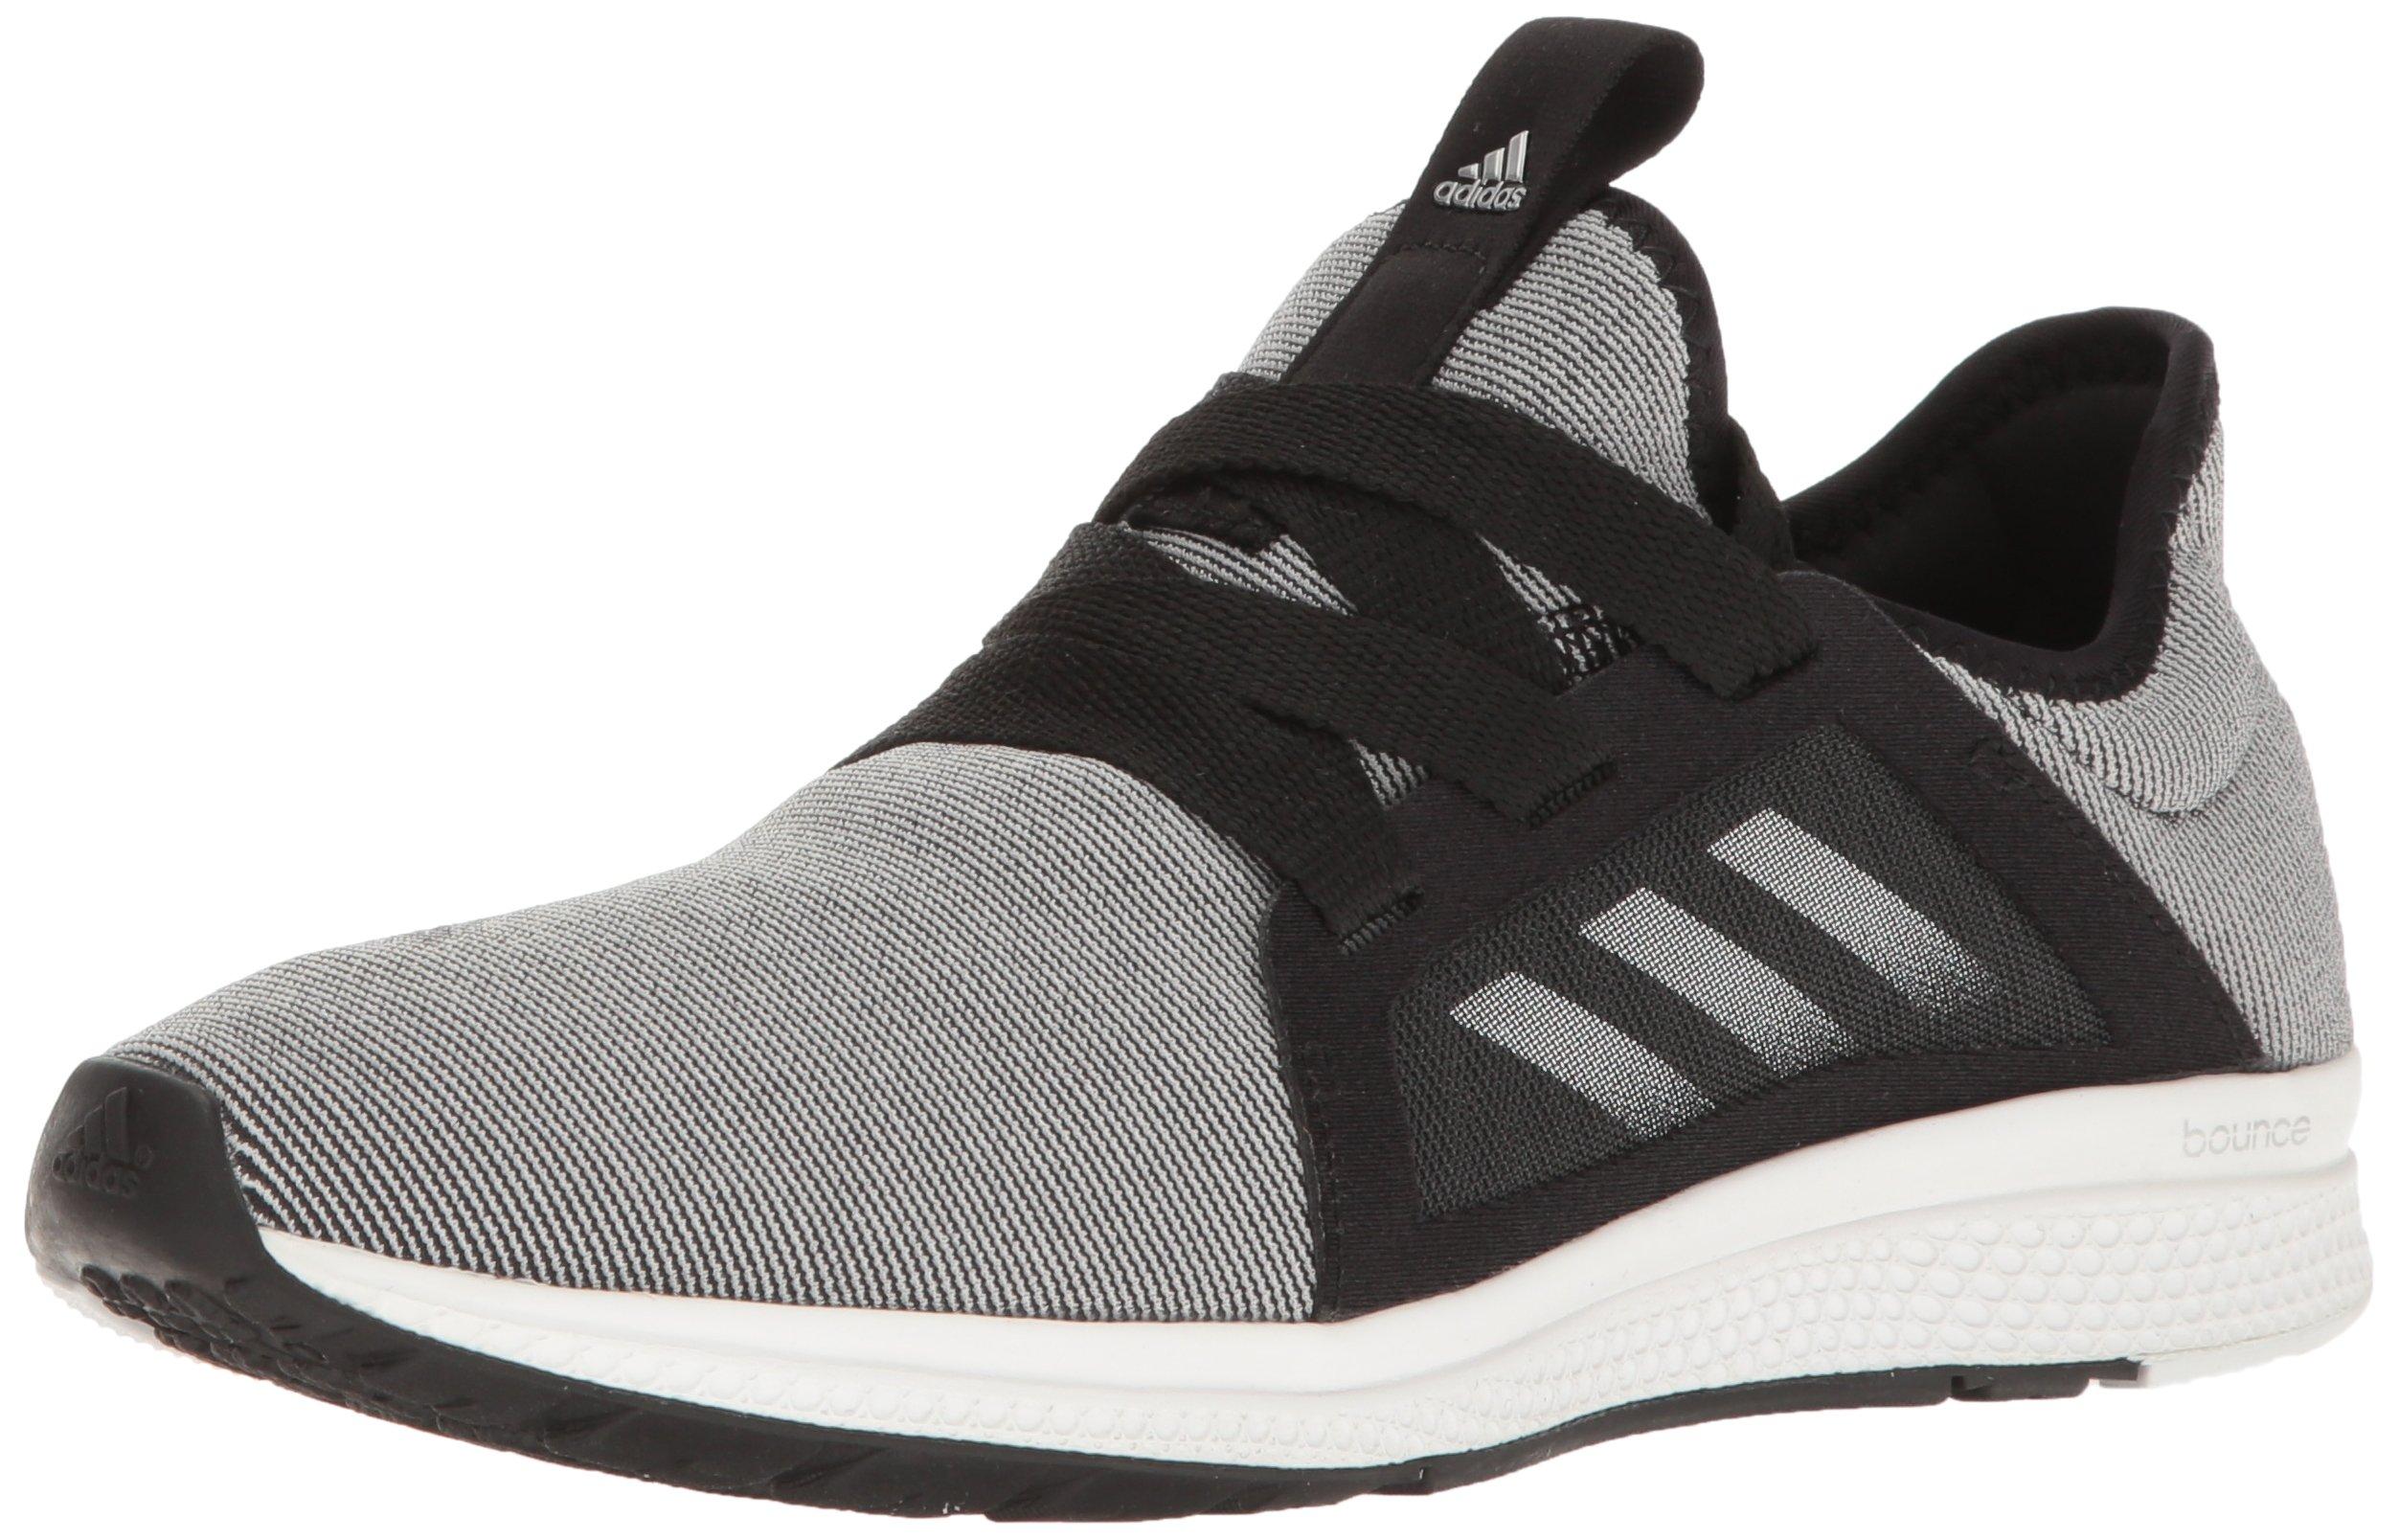 adidas Performance Women's Edge Lux W Running Shoe, Black/White/Metallic/Silver, 6 M US